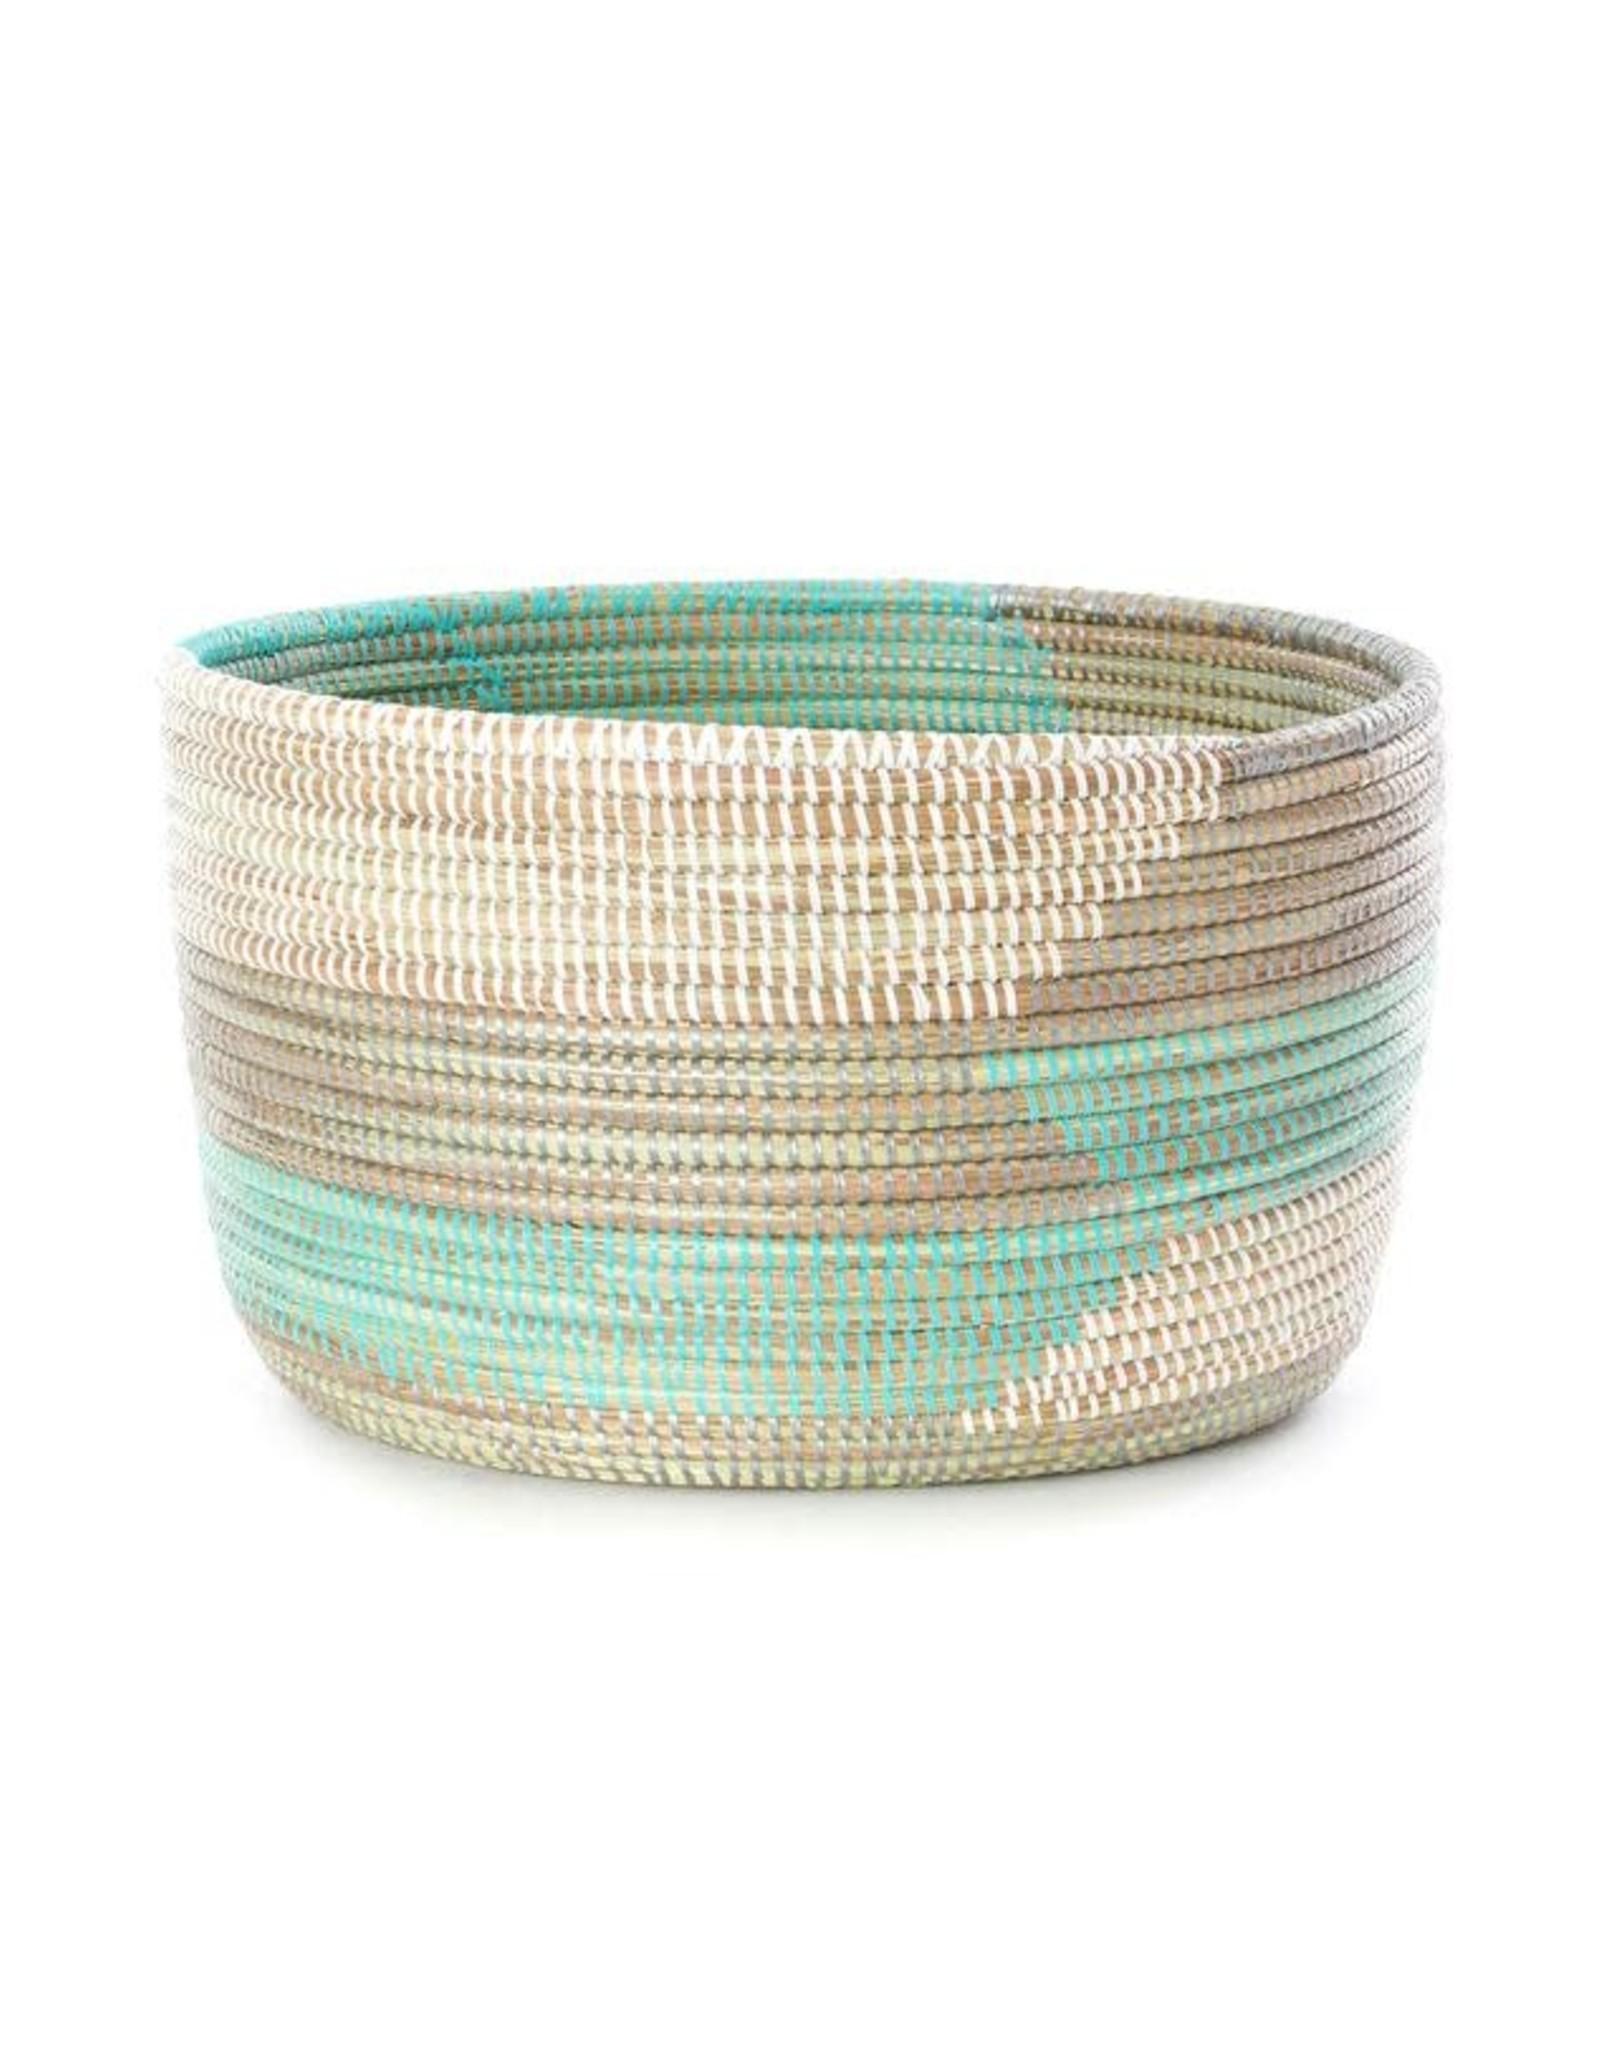 Swahili Wholesale Knitting Basket, Senegal